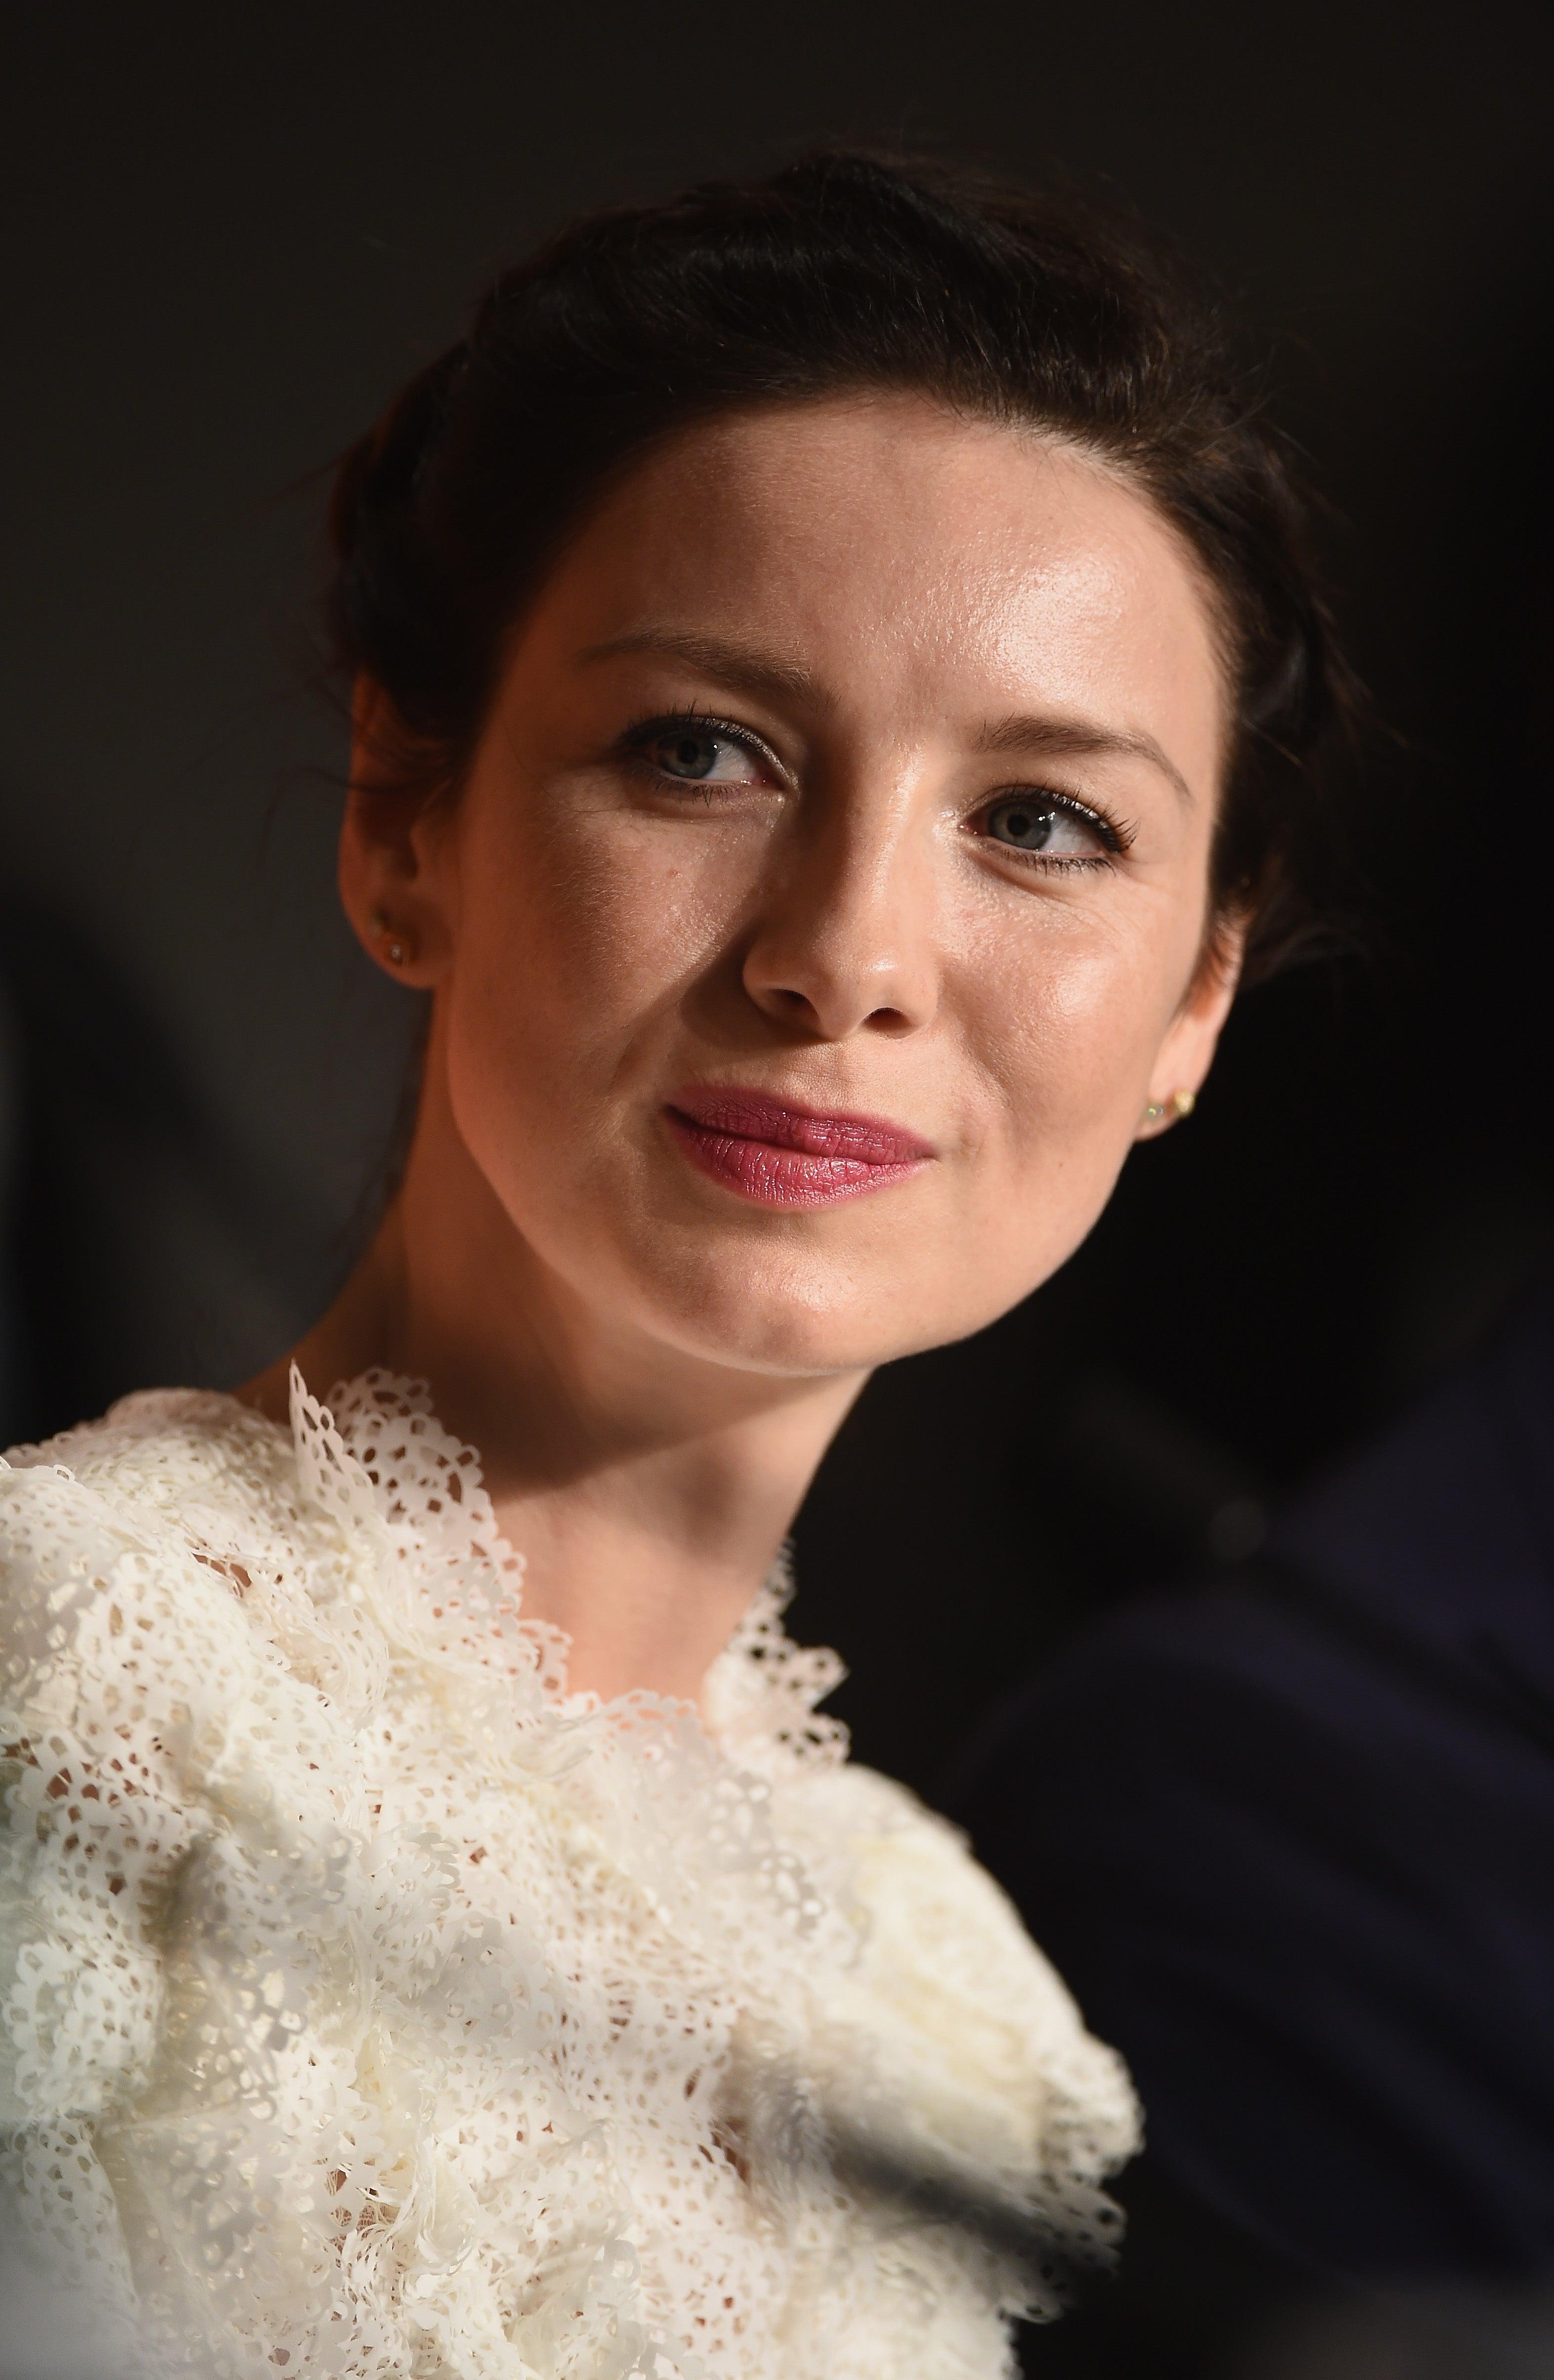 Actress Caitriona Balfe